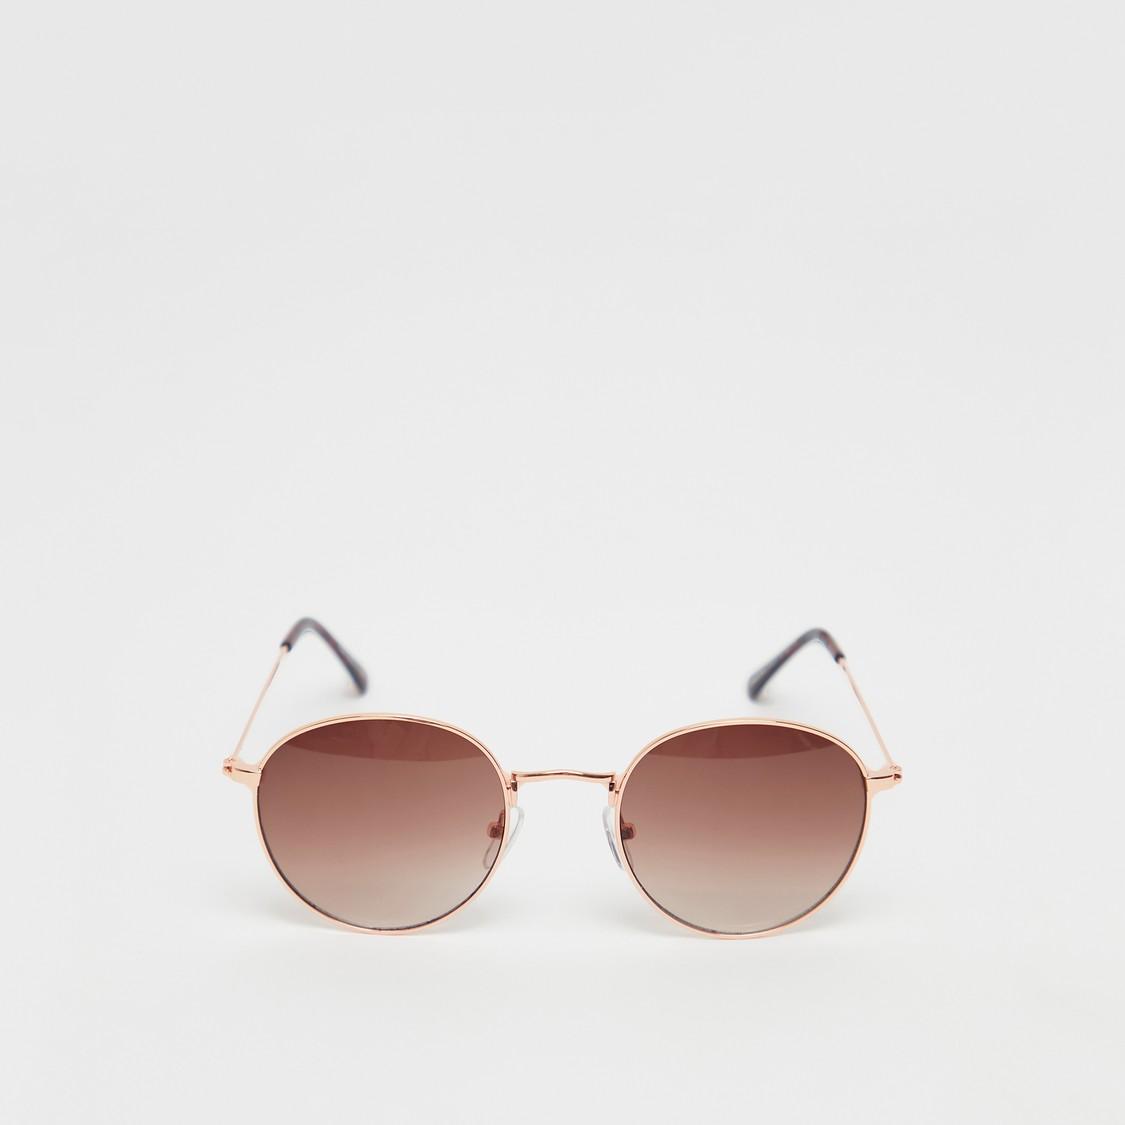 Metal Round Solid Sunglasses